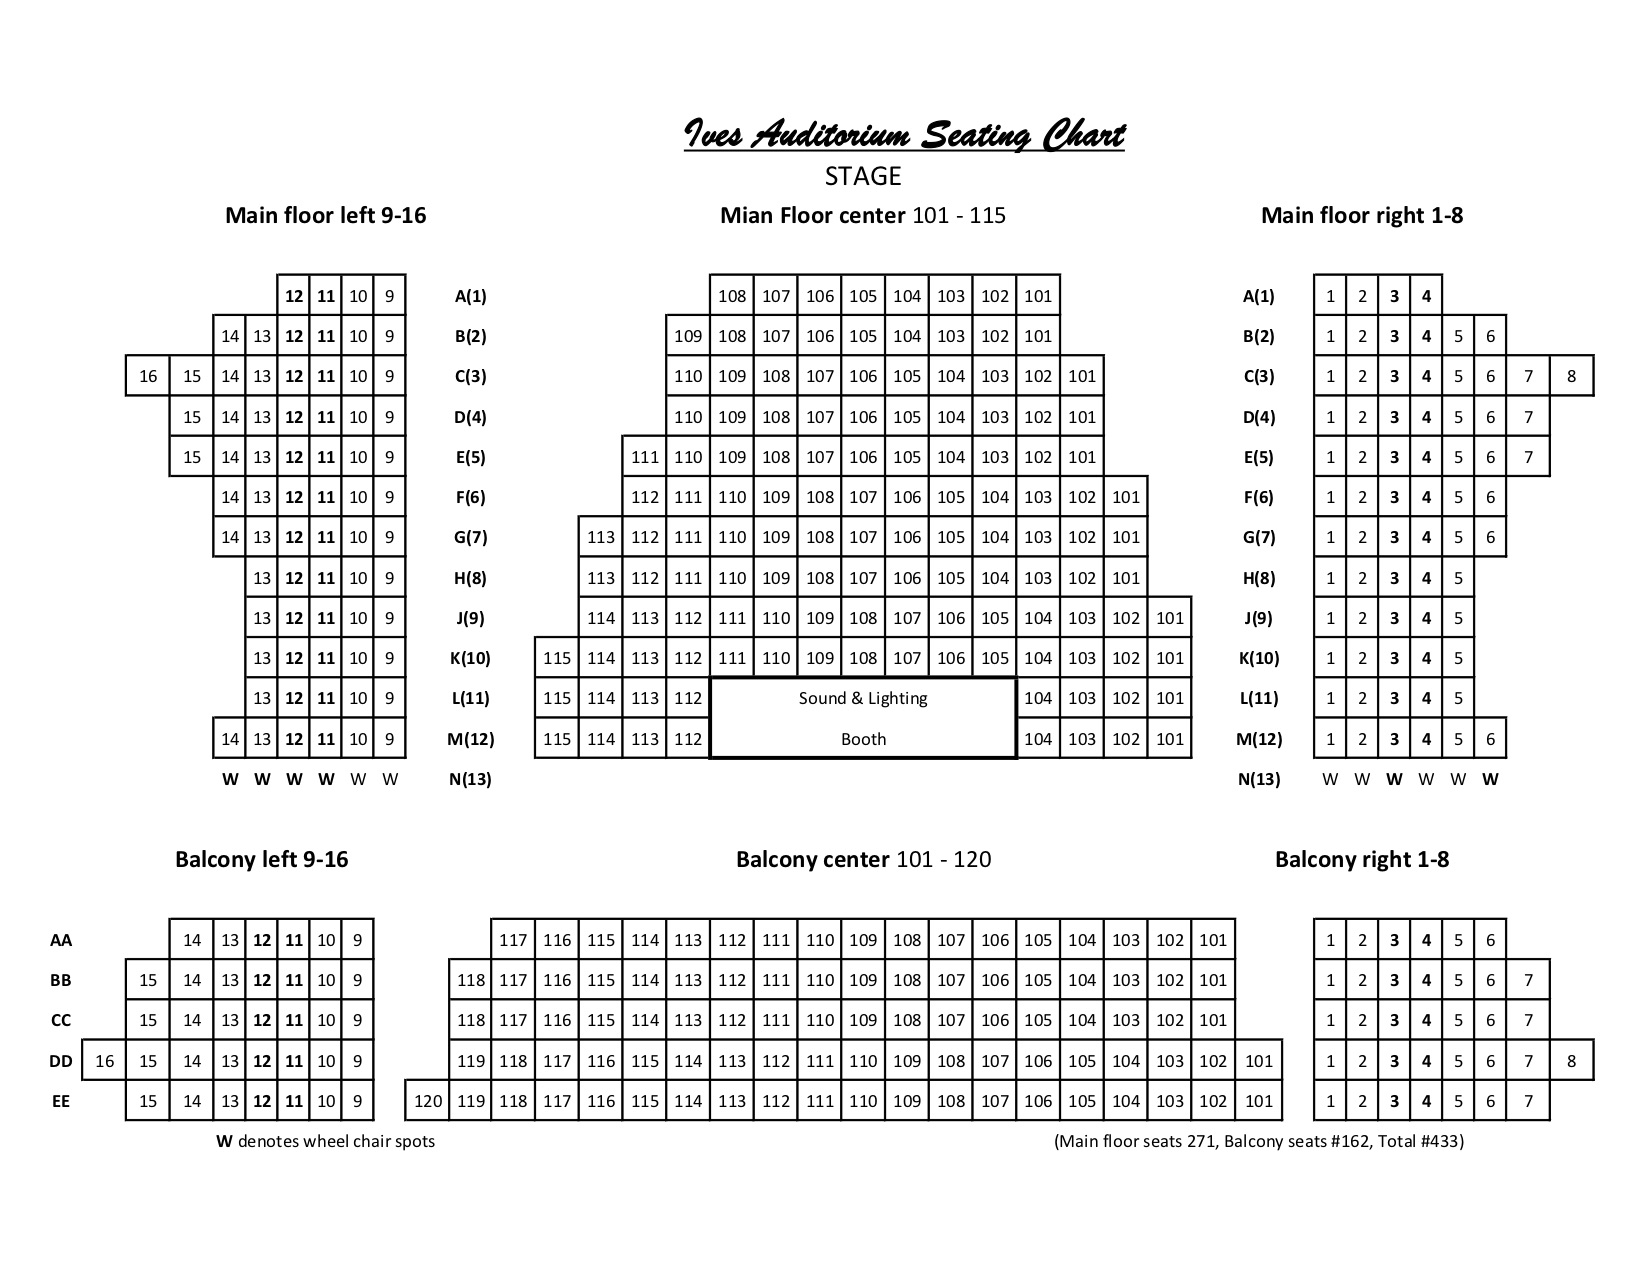 IVES SEATNG CHART.jpg